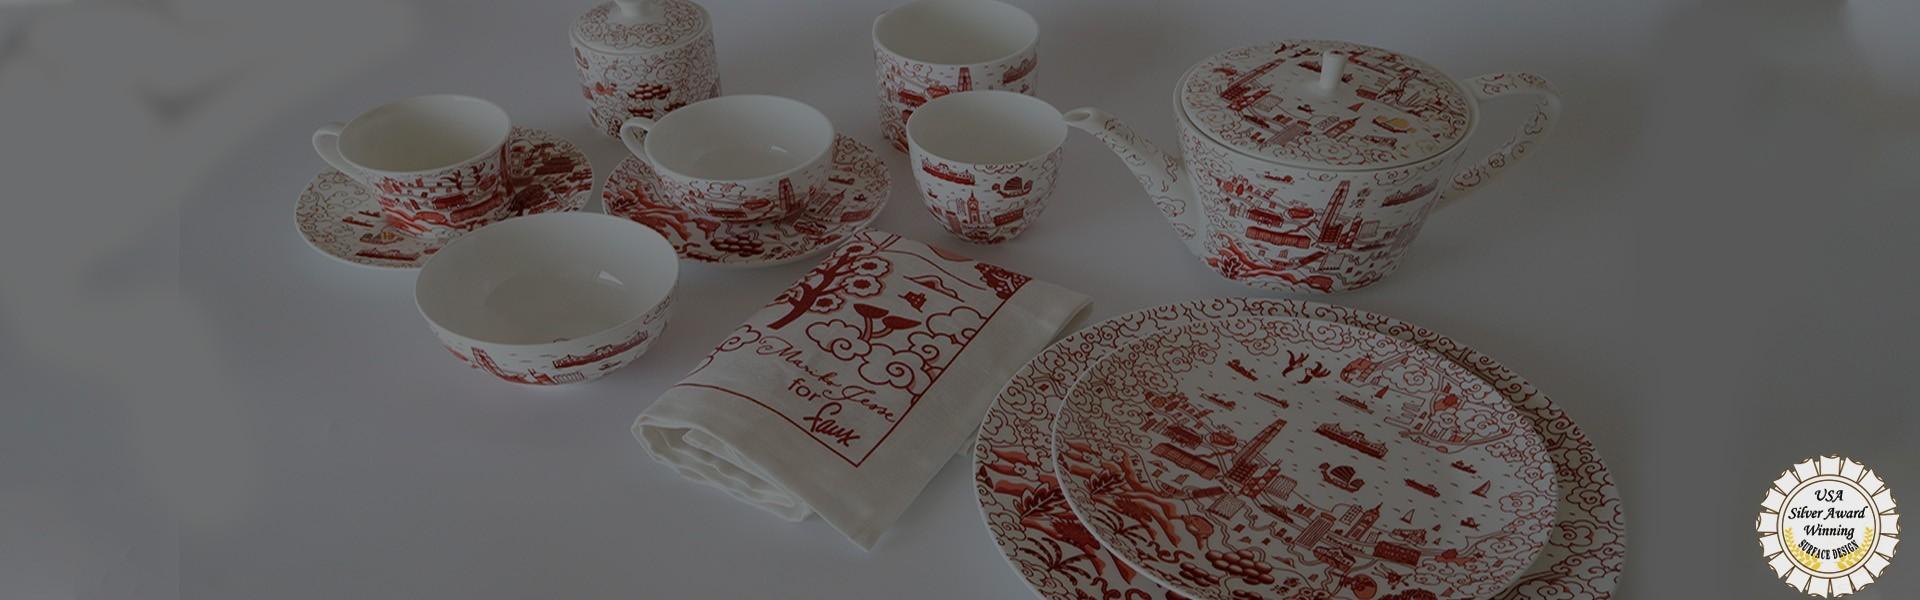 Willow Pattern - Plates - Ceramics